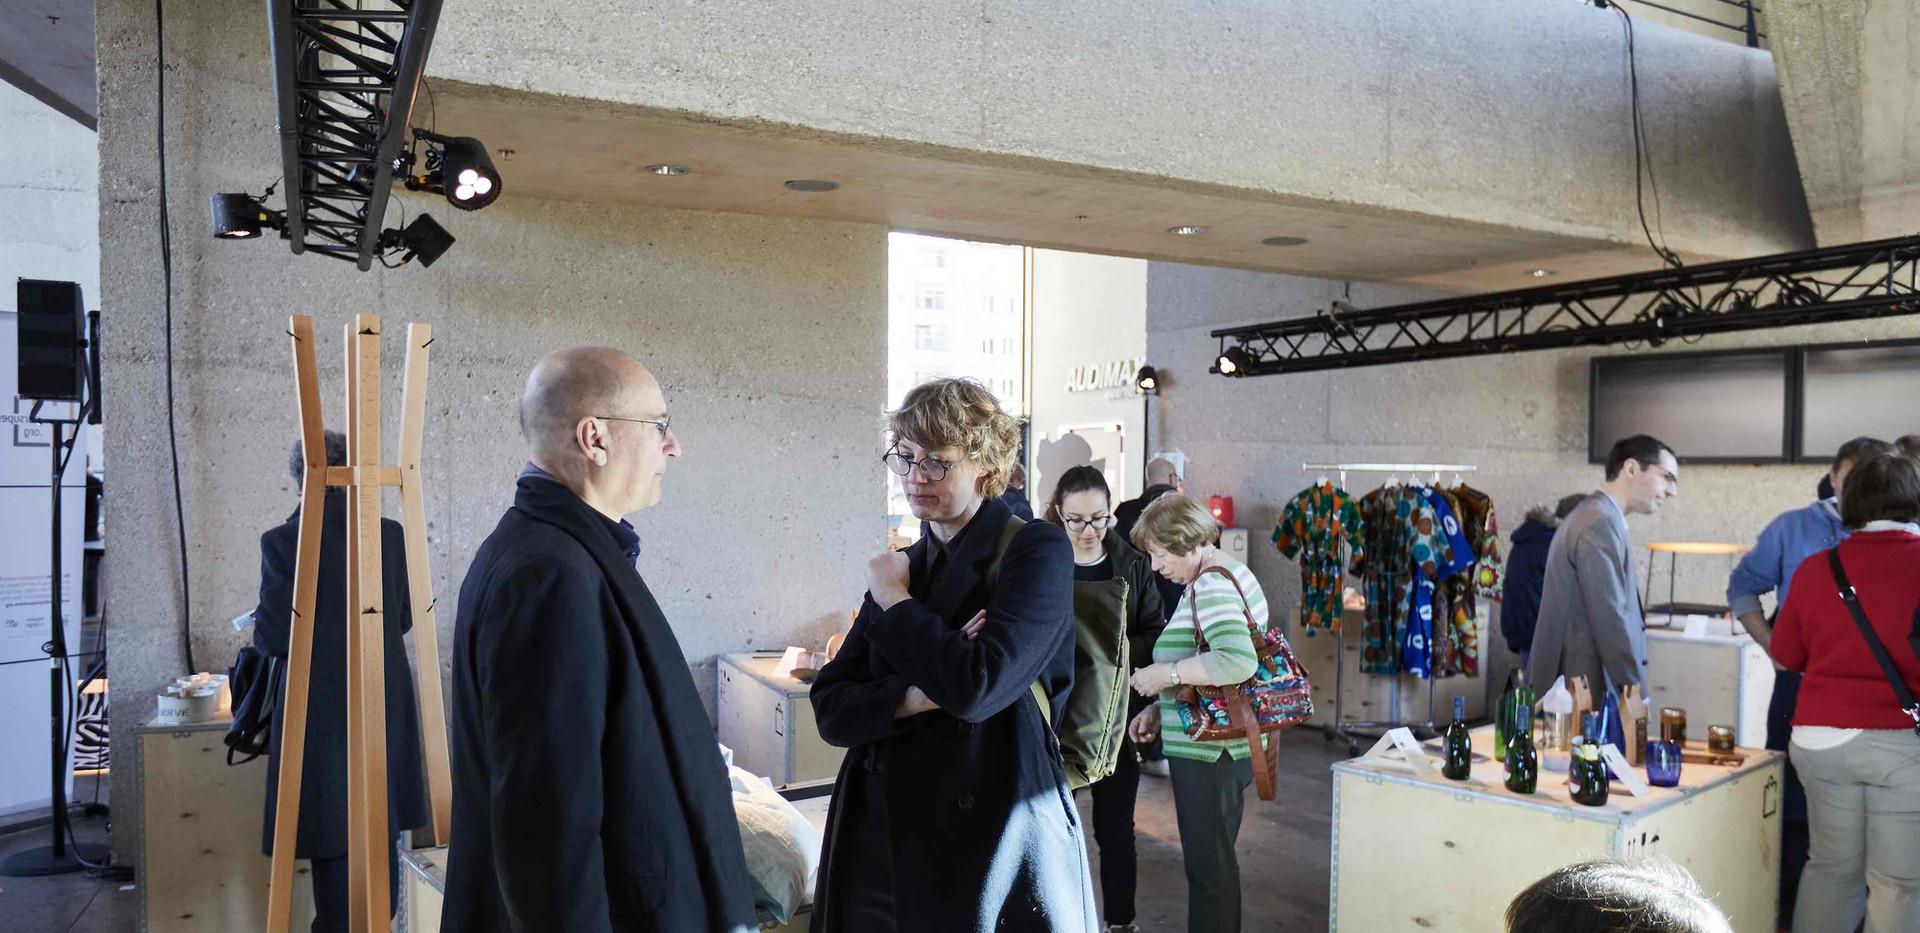 Boris Kochan, Präsident Deutscher Designtag e.V. Prof. Daniela Hensel, Professorin im Studiengang Kommunikationsdesign HTW Berlin